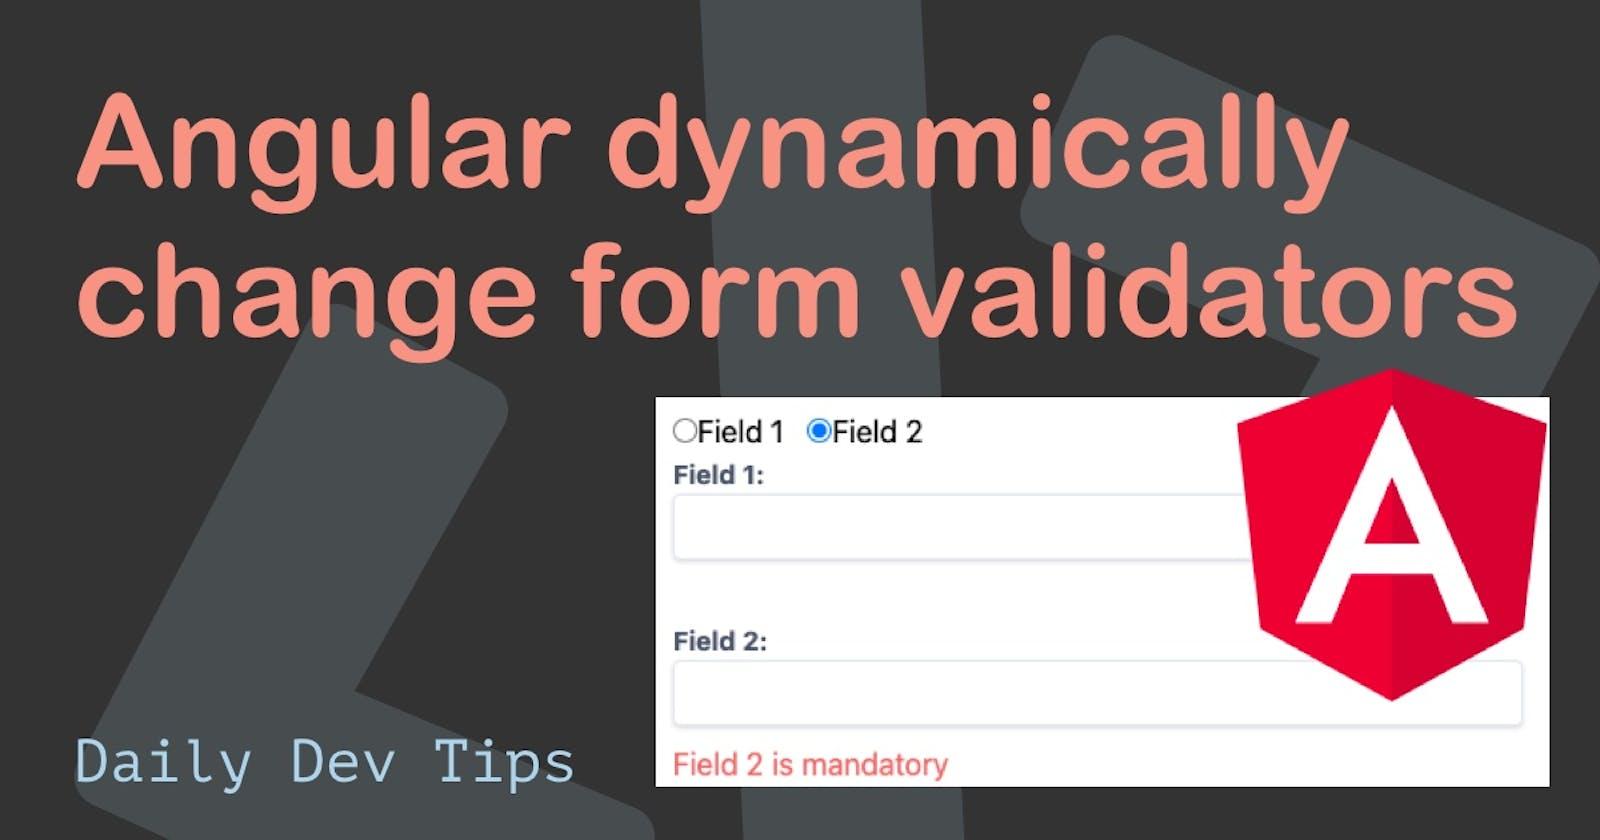 Angular dynamically change form validators